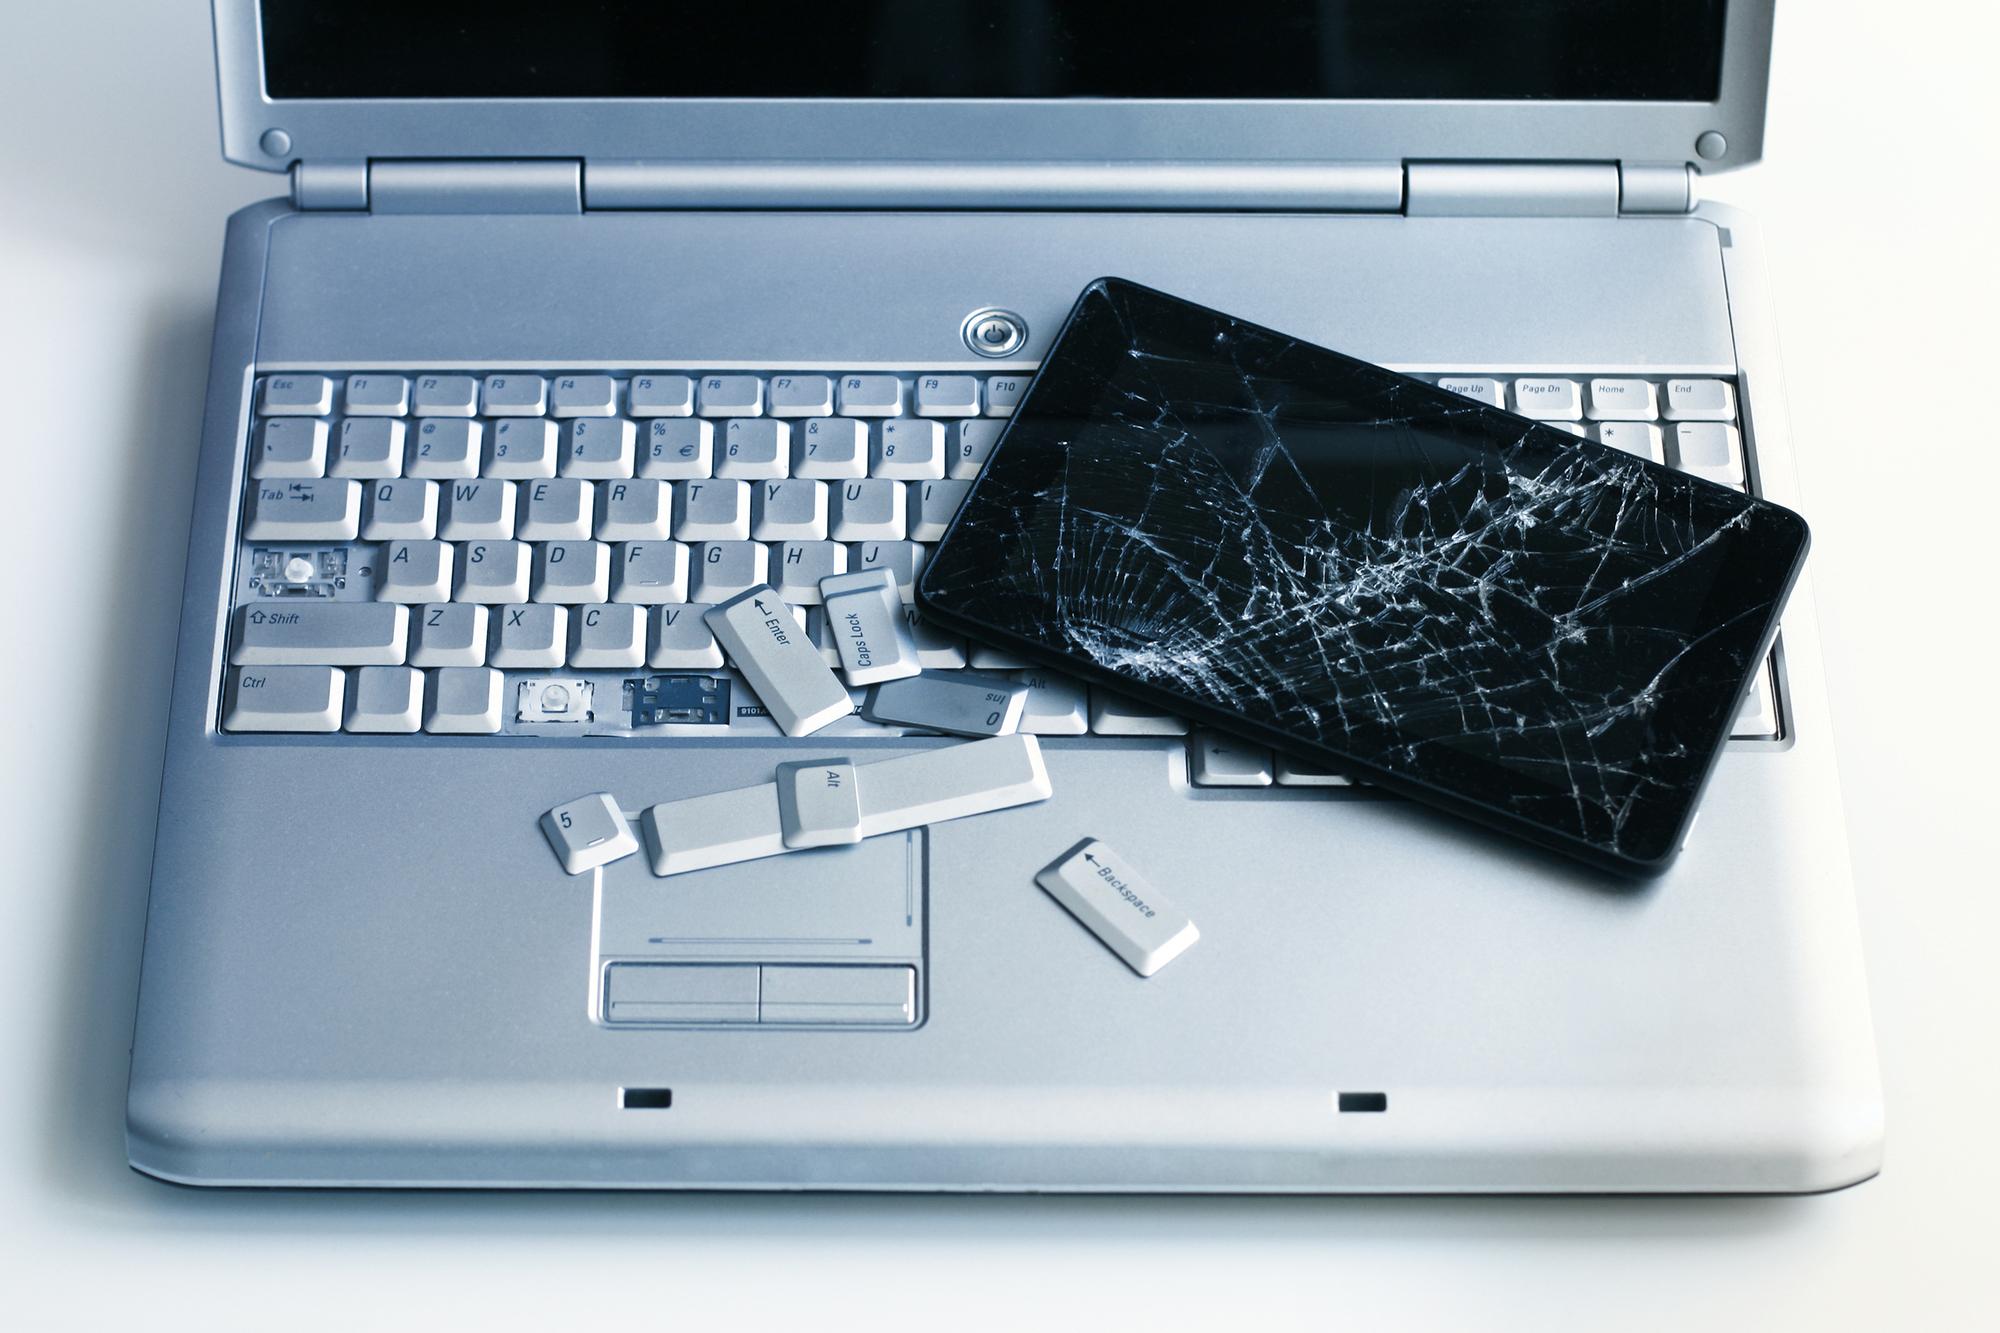 sumo-repair-laptop-handy-reparatur